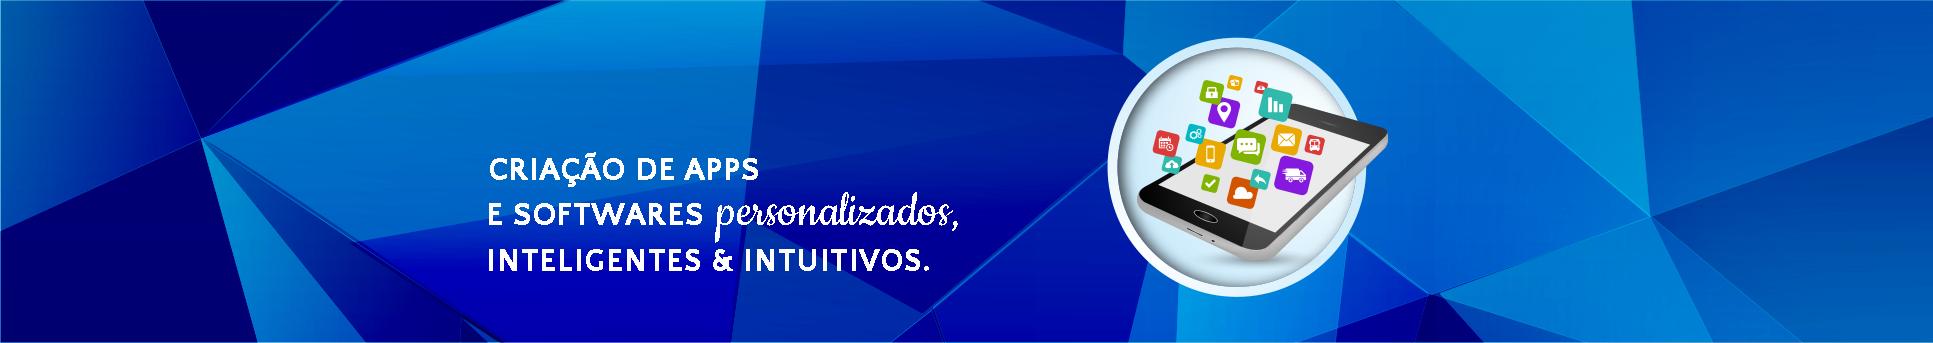 bg_top_servicos1